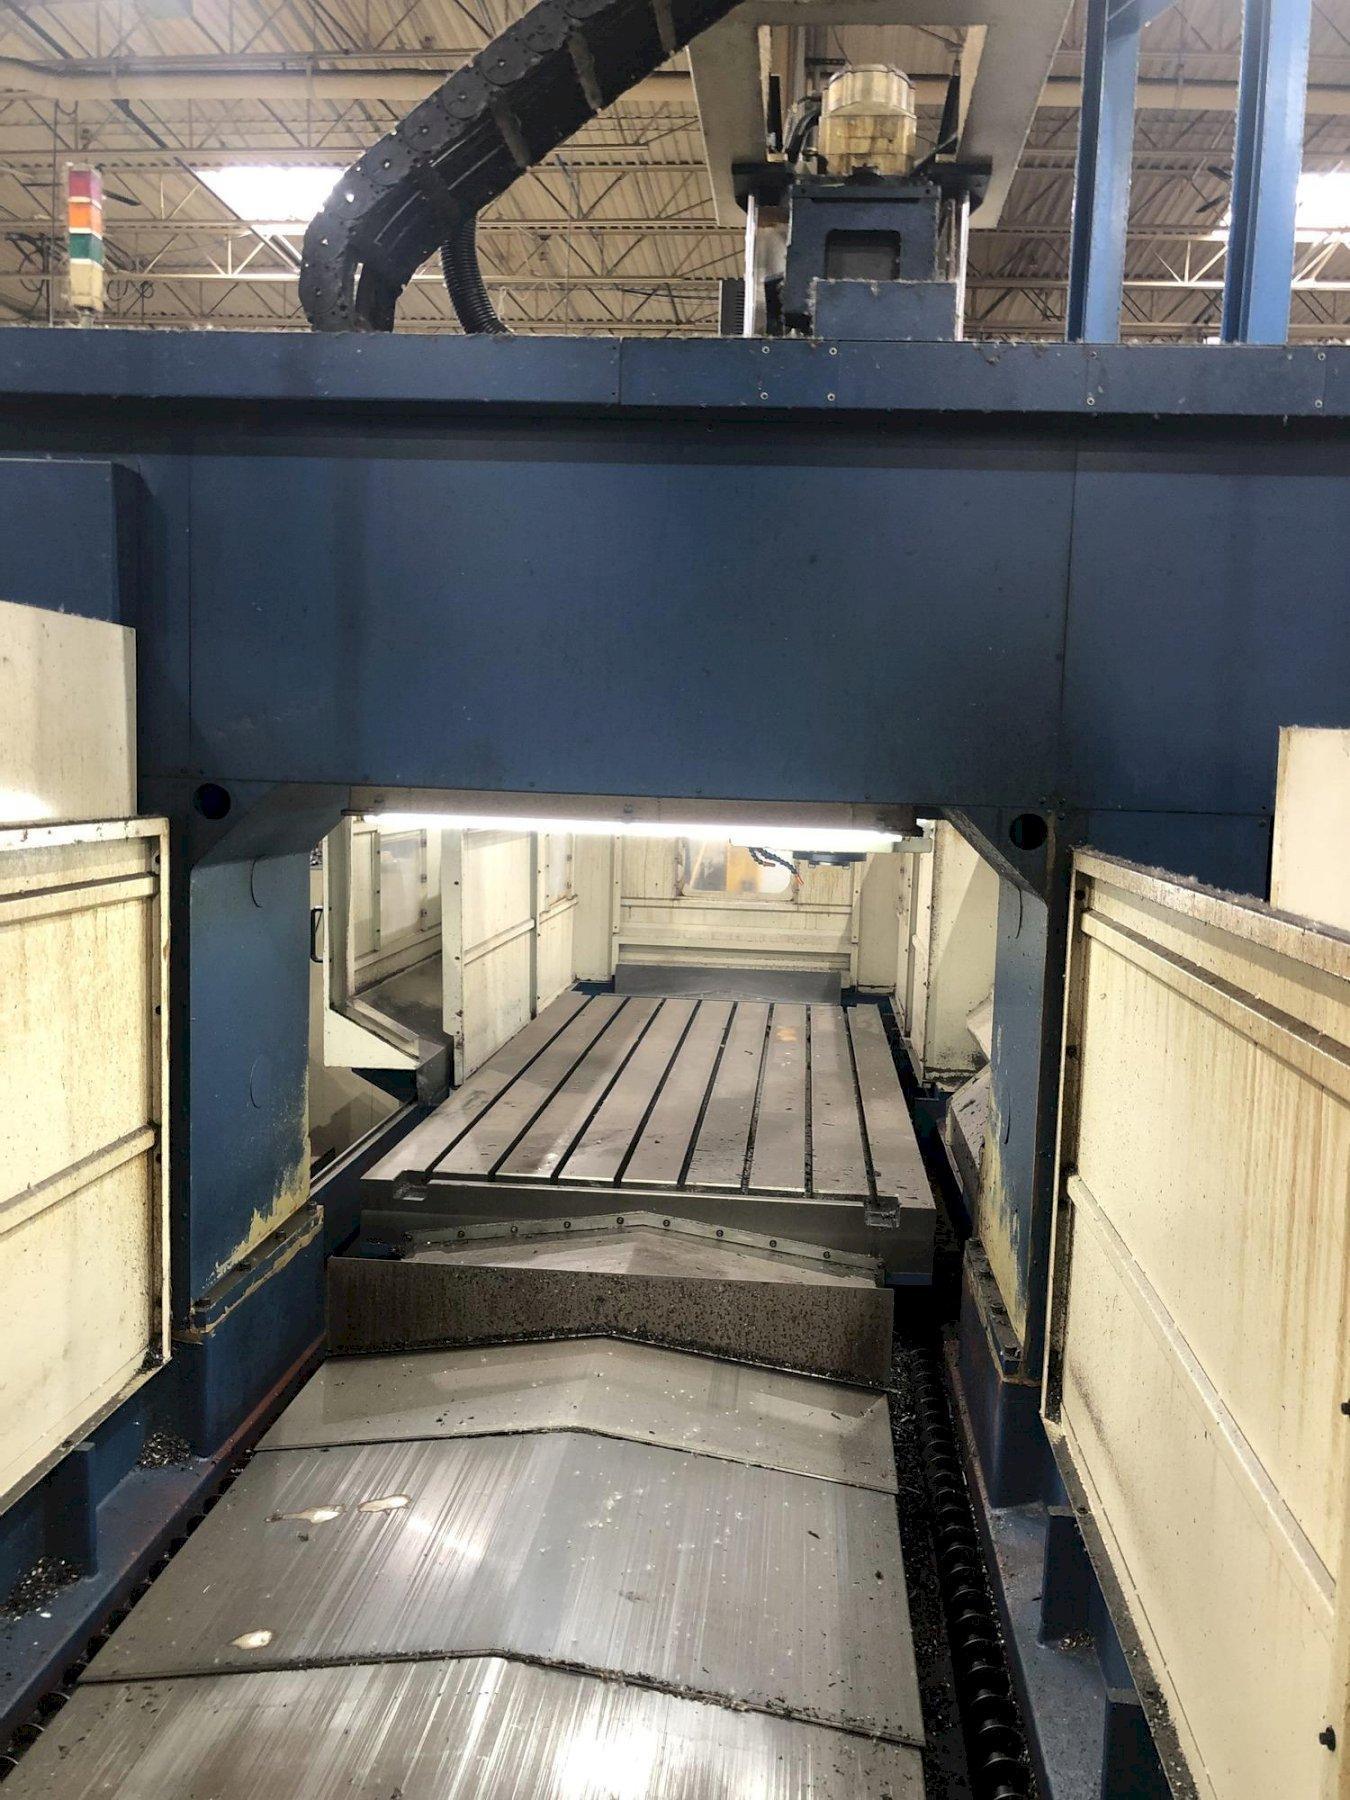 Awea Model SP-3016 CNC Bridge Type Machining Center